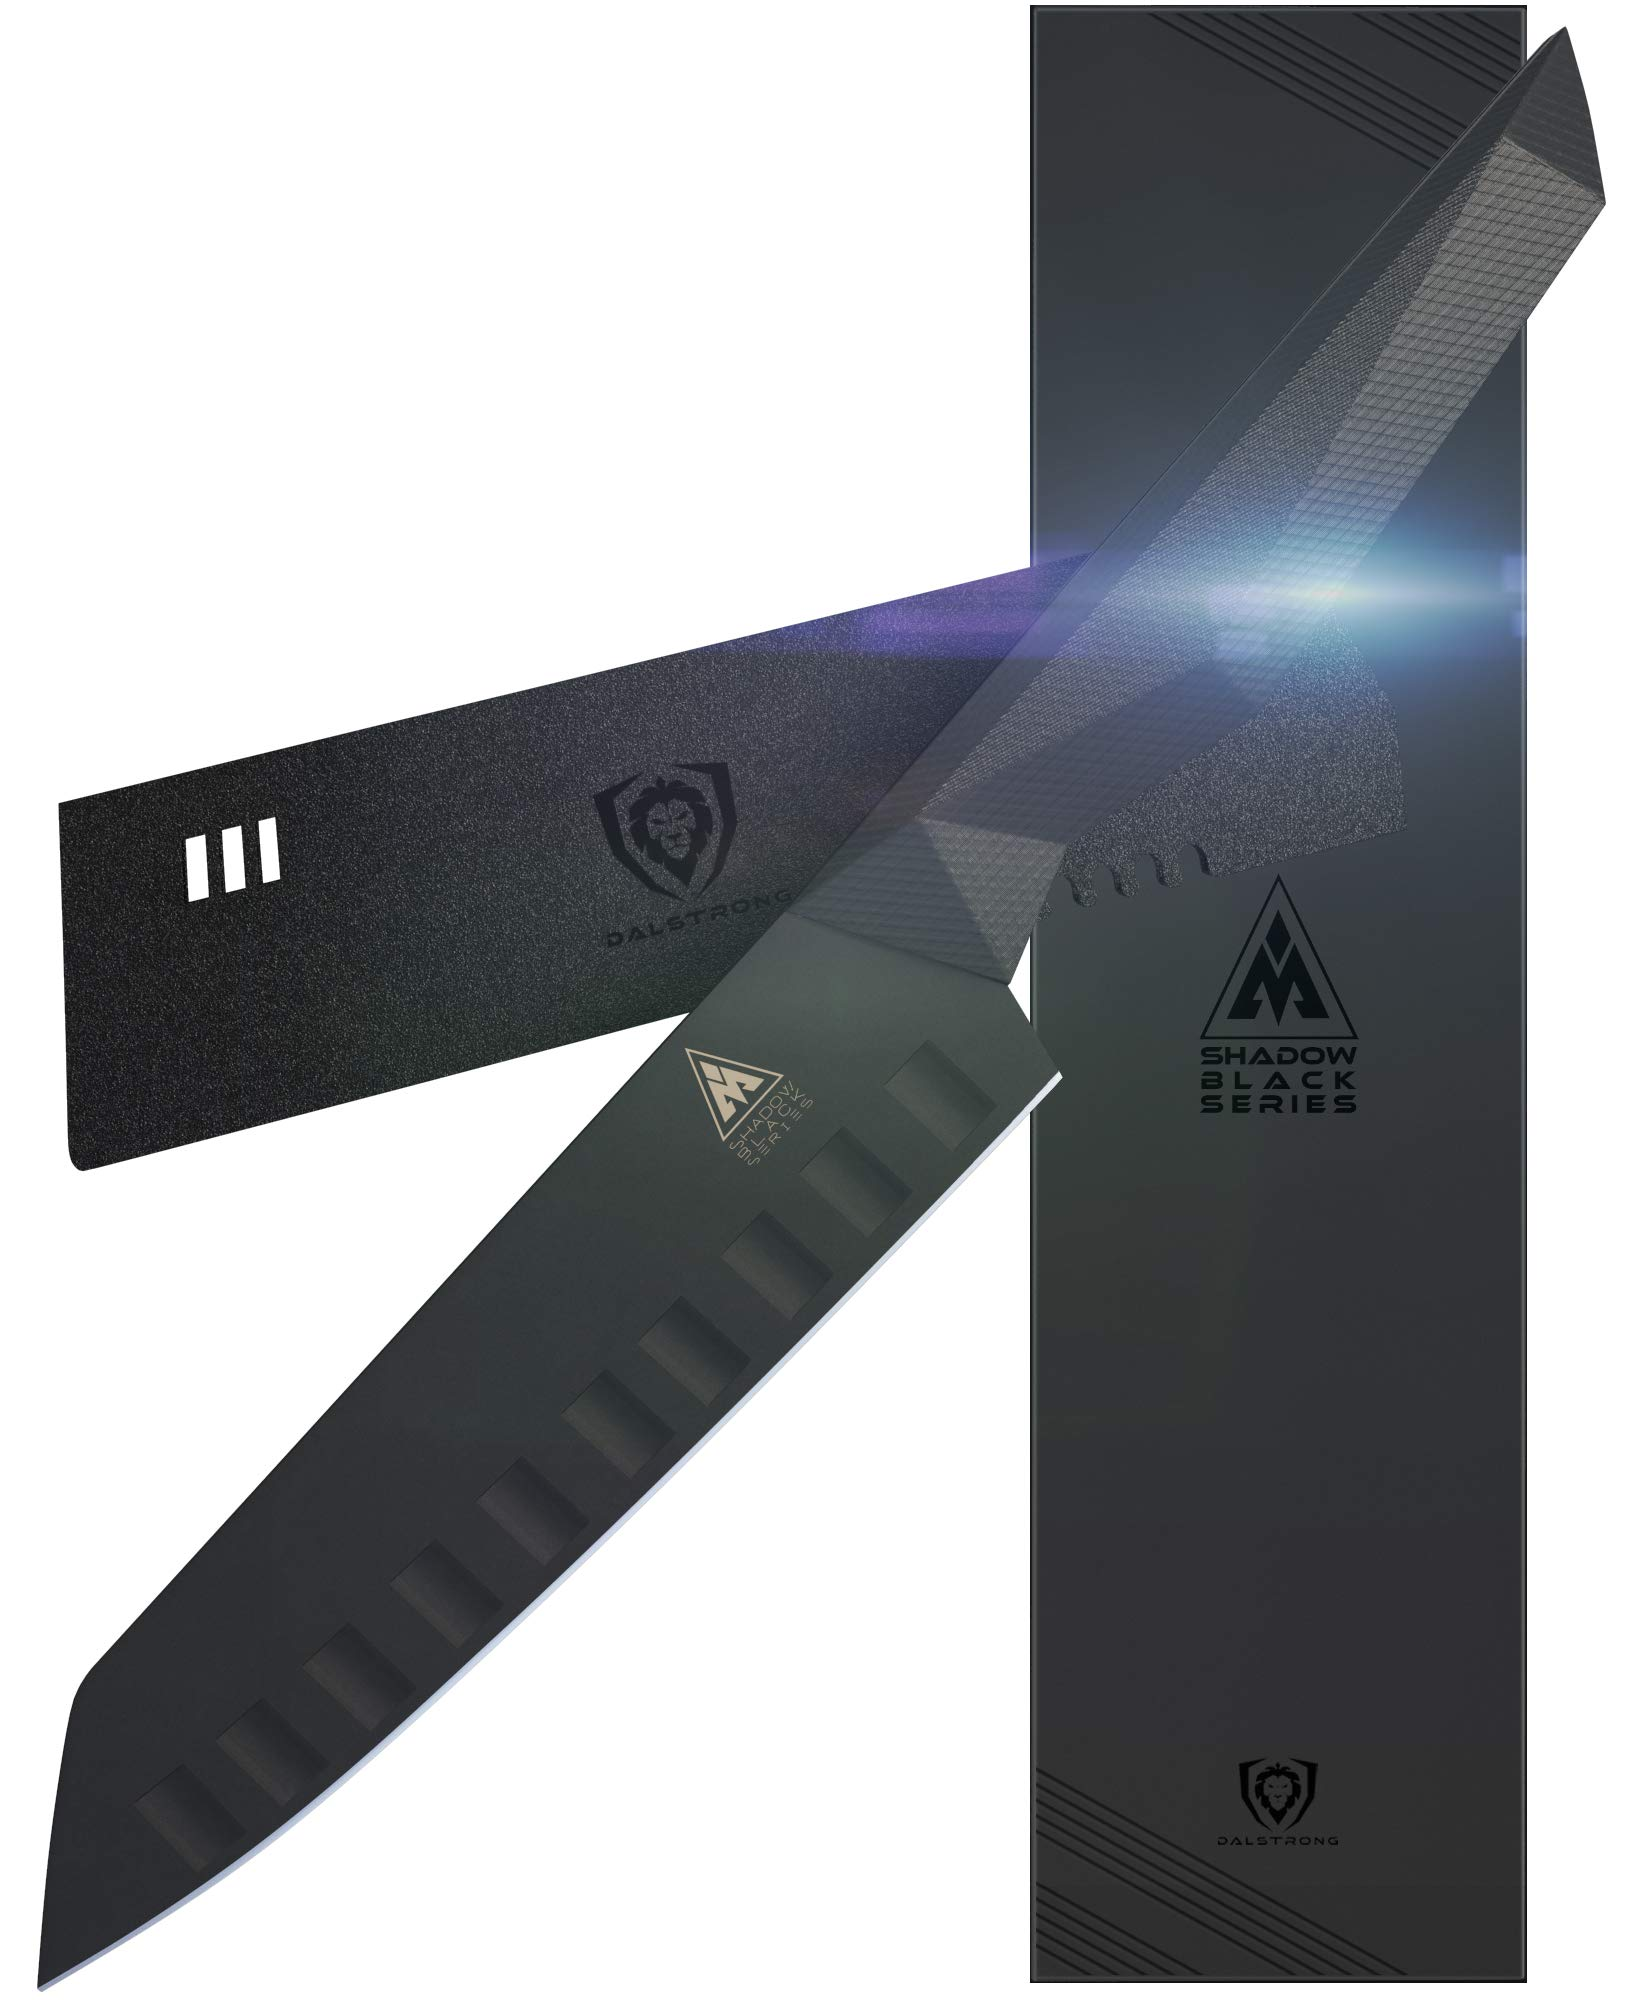 Dalstrong - Shadow Black Series - Black Titanium Nitride Coated German HC Steel - Sheath (7'' Santoku)